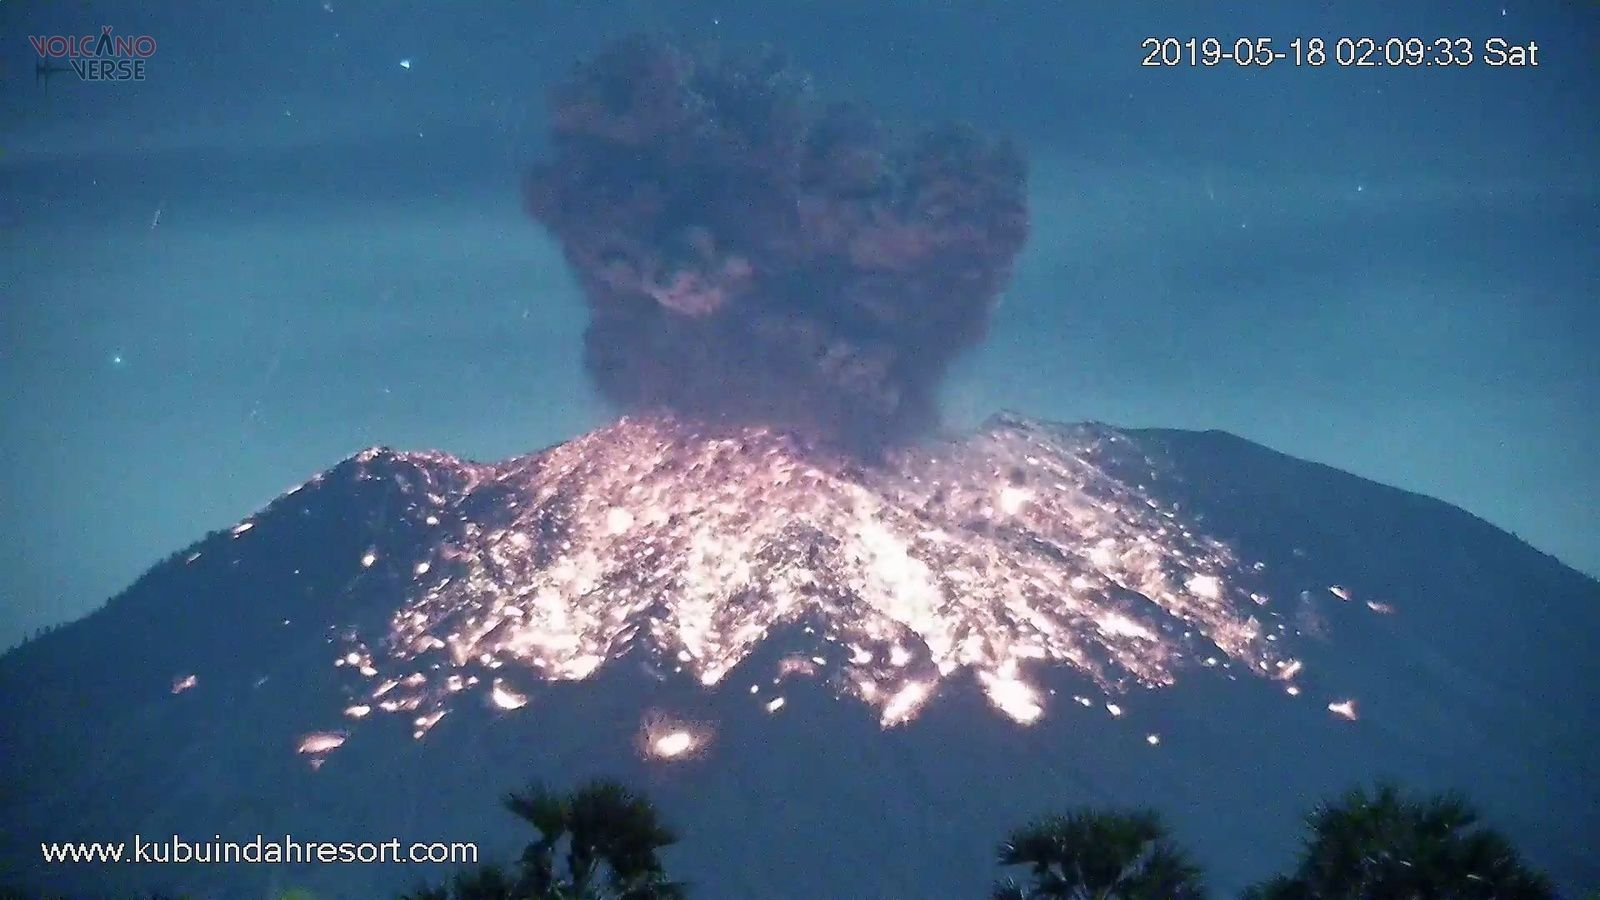 Agung - 18.05.2019 / de 02h09 à 02h12 - photos VolcanoVerse / Kubuindahresort